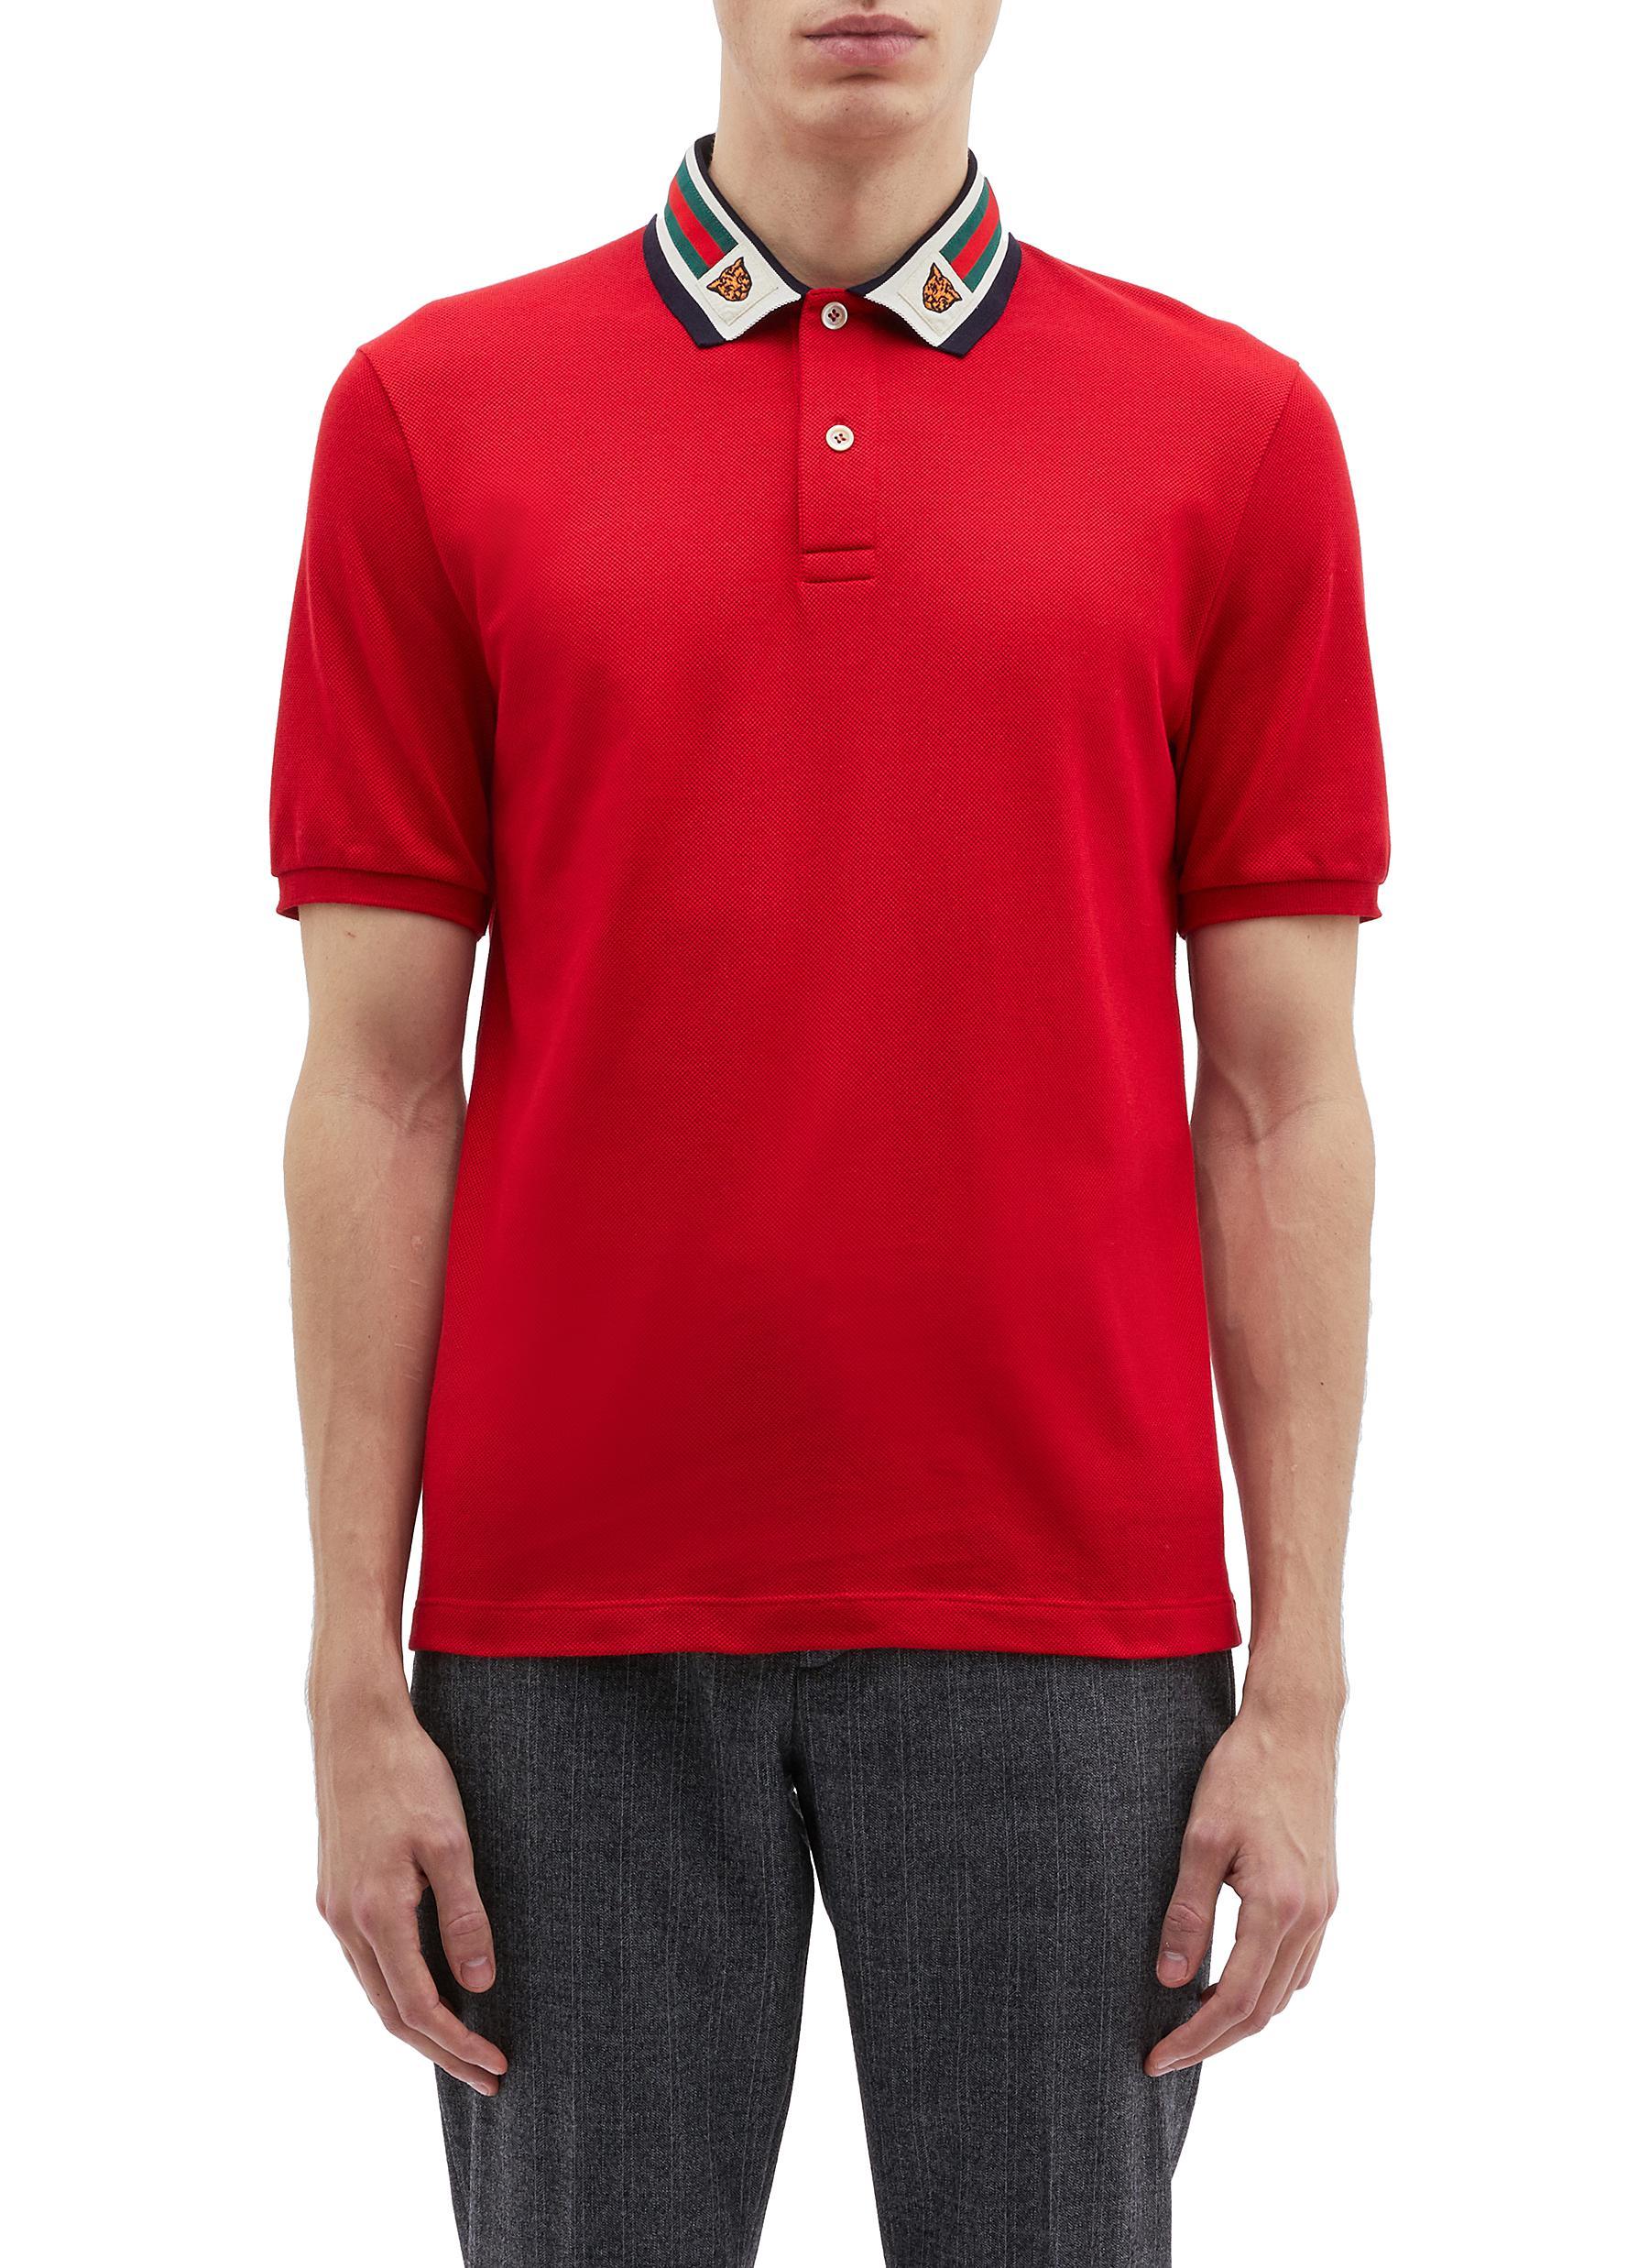 a45d626a1 GUCCI | Tiger embroidered Web stripe collar polo shirt | Men | Lane ...